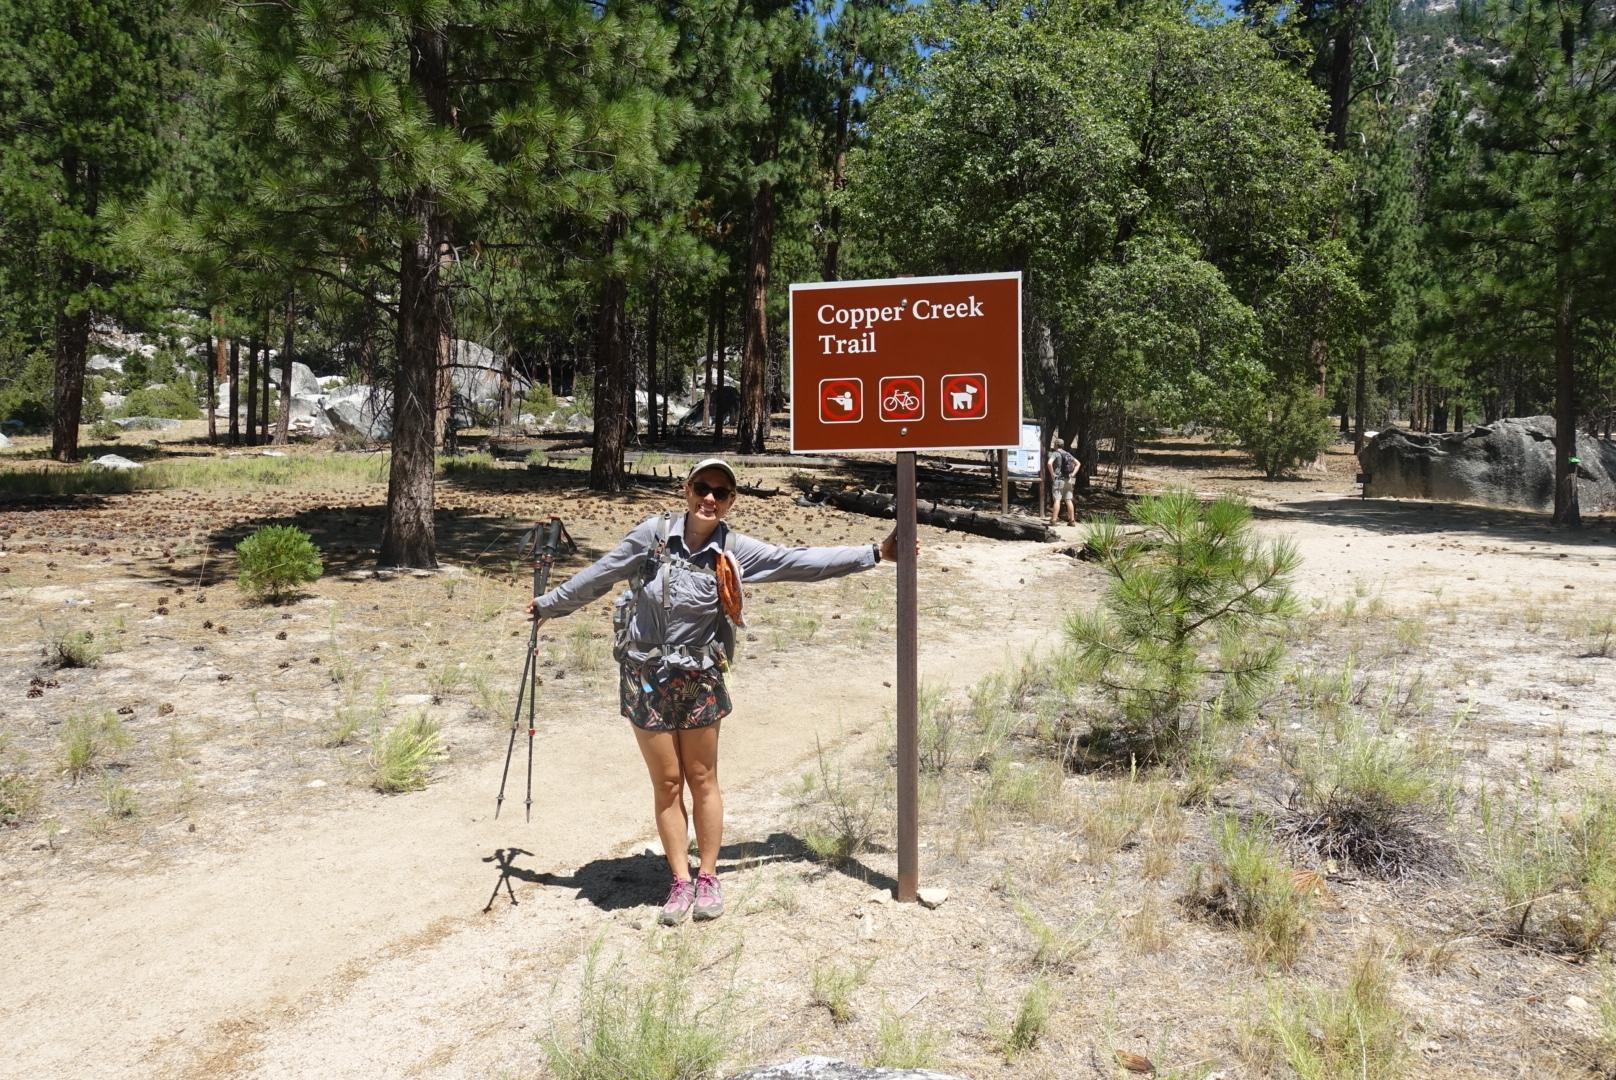 Starting at Copper Creek Trail Head